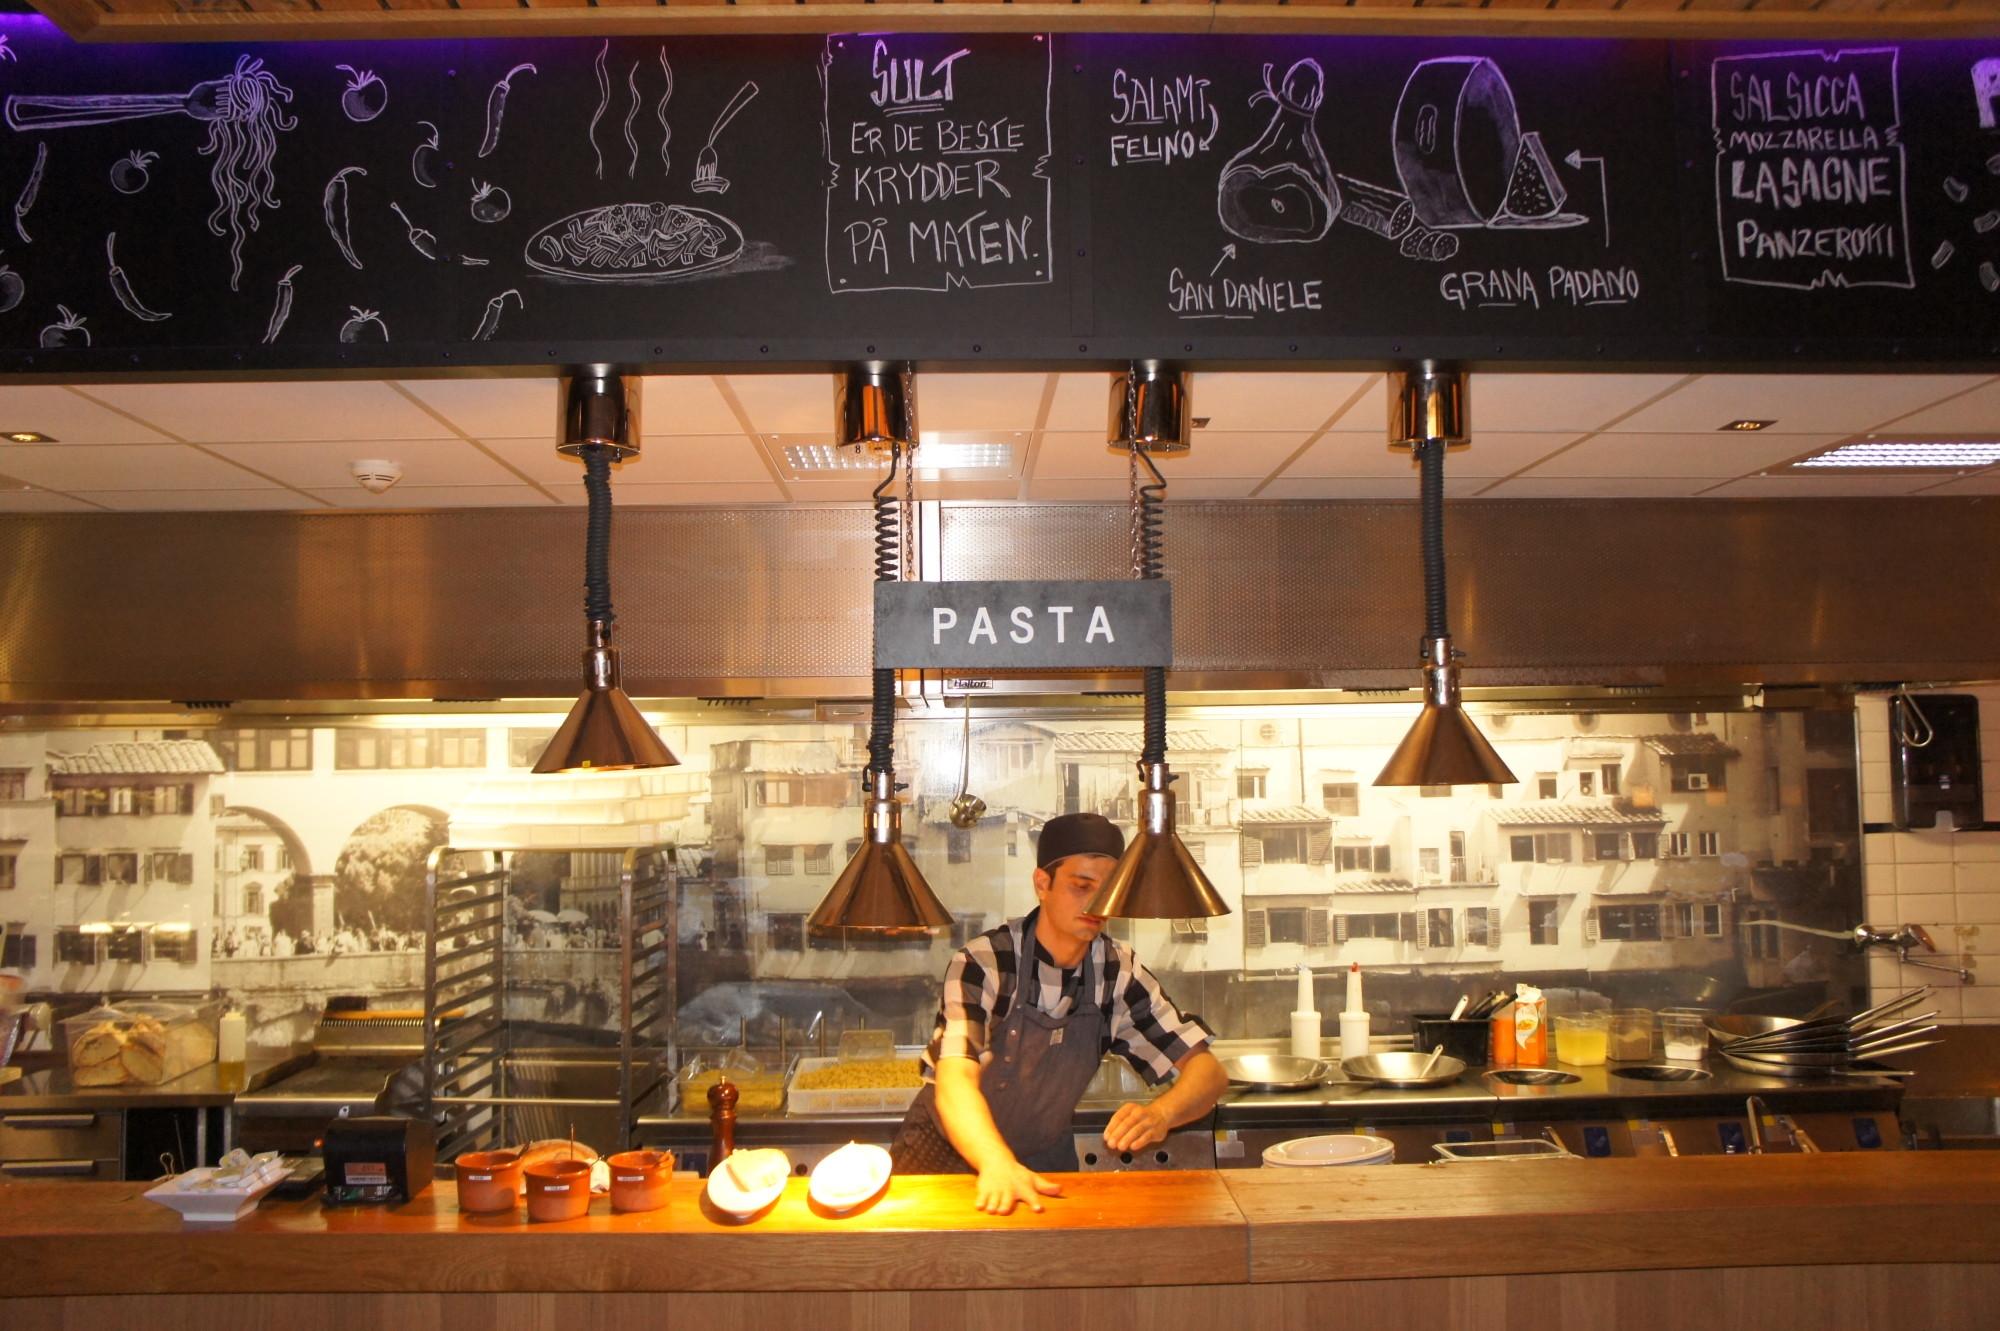 Pastafabrikken, Tromso, Norway